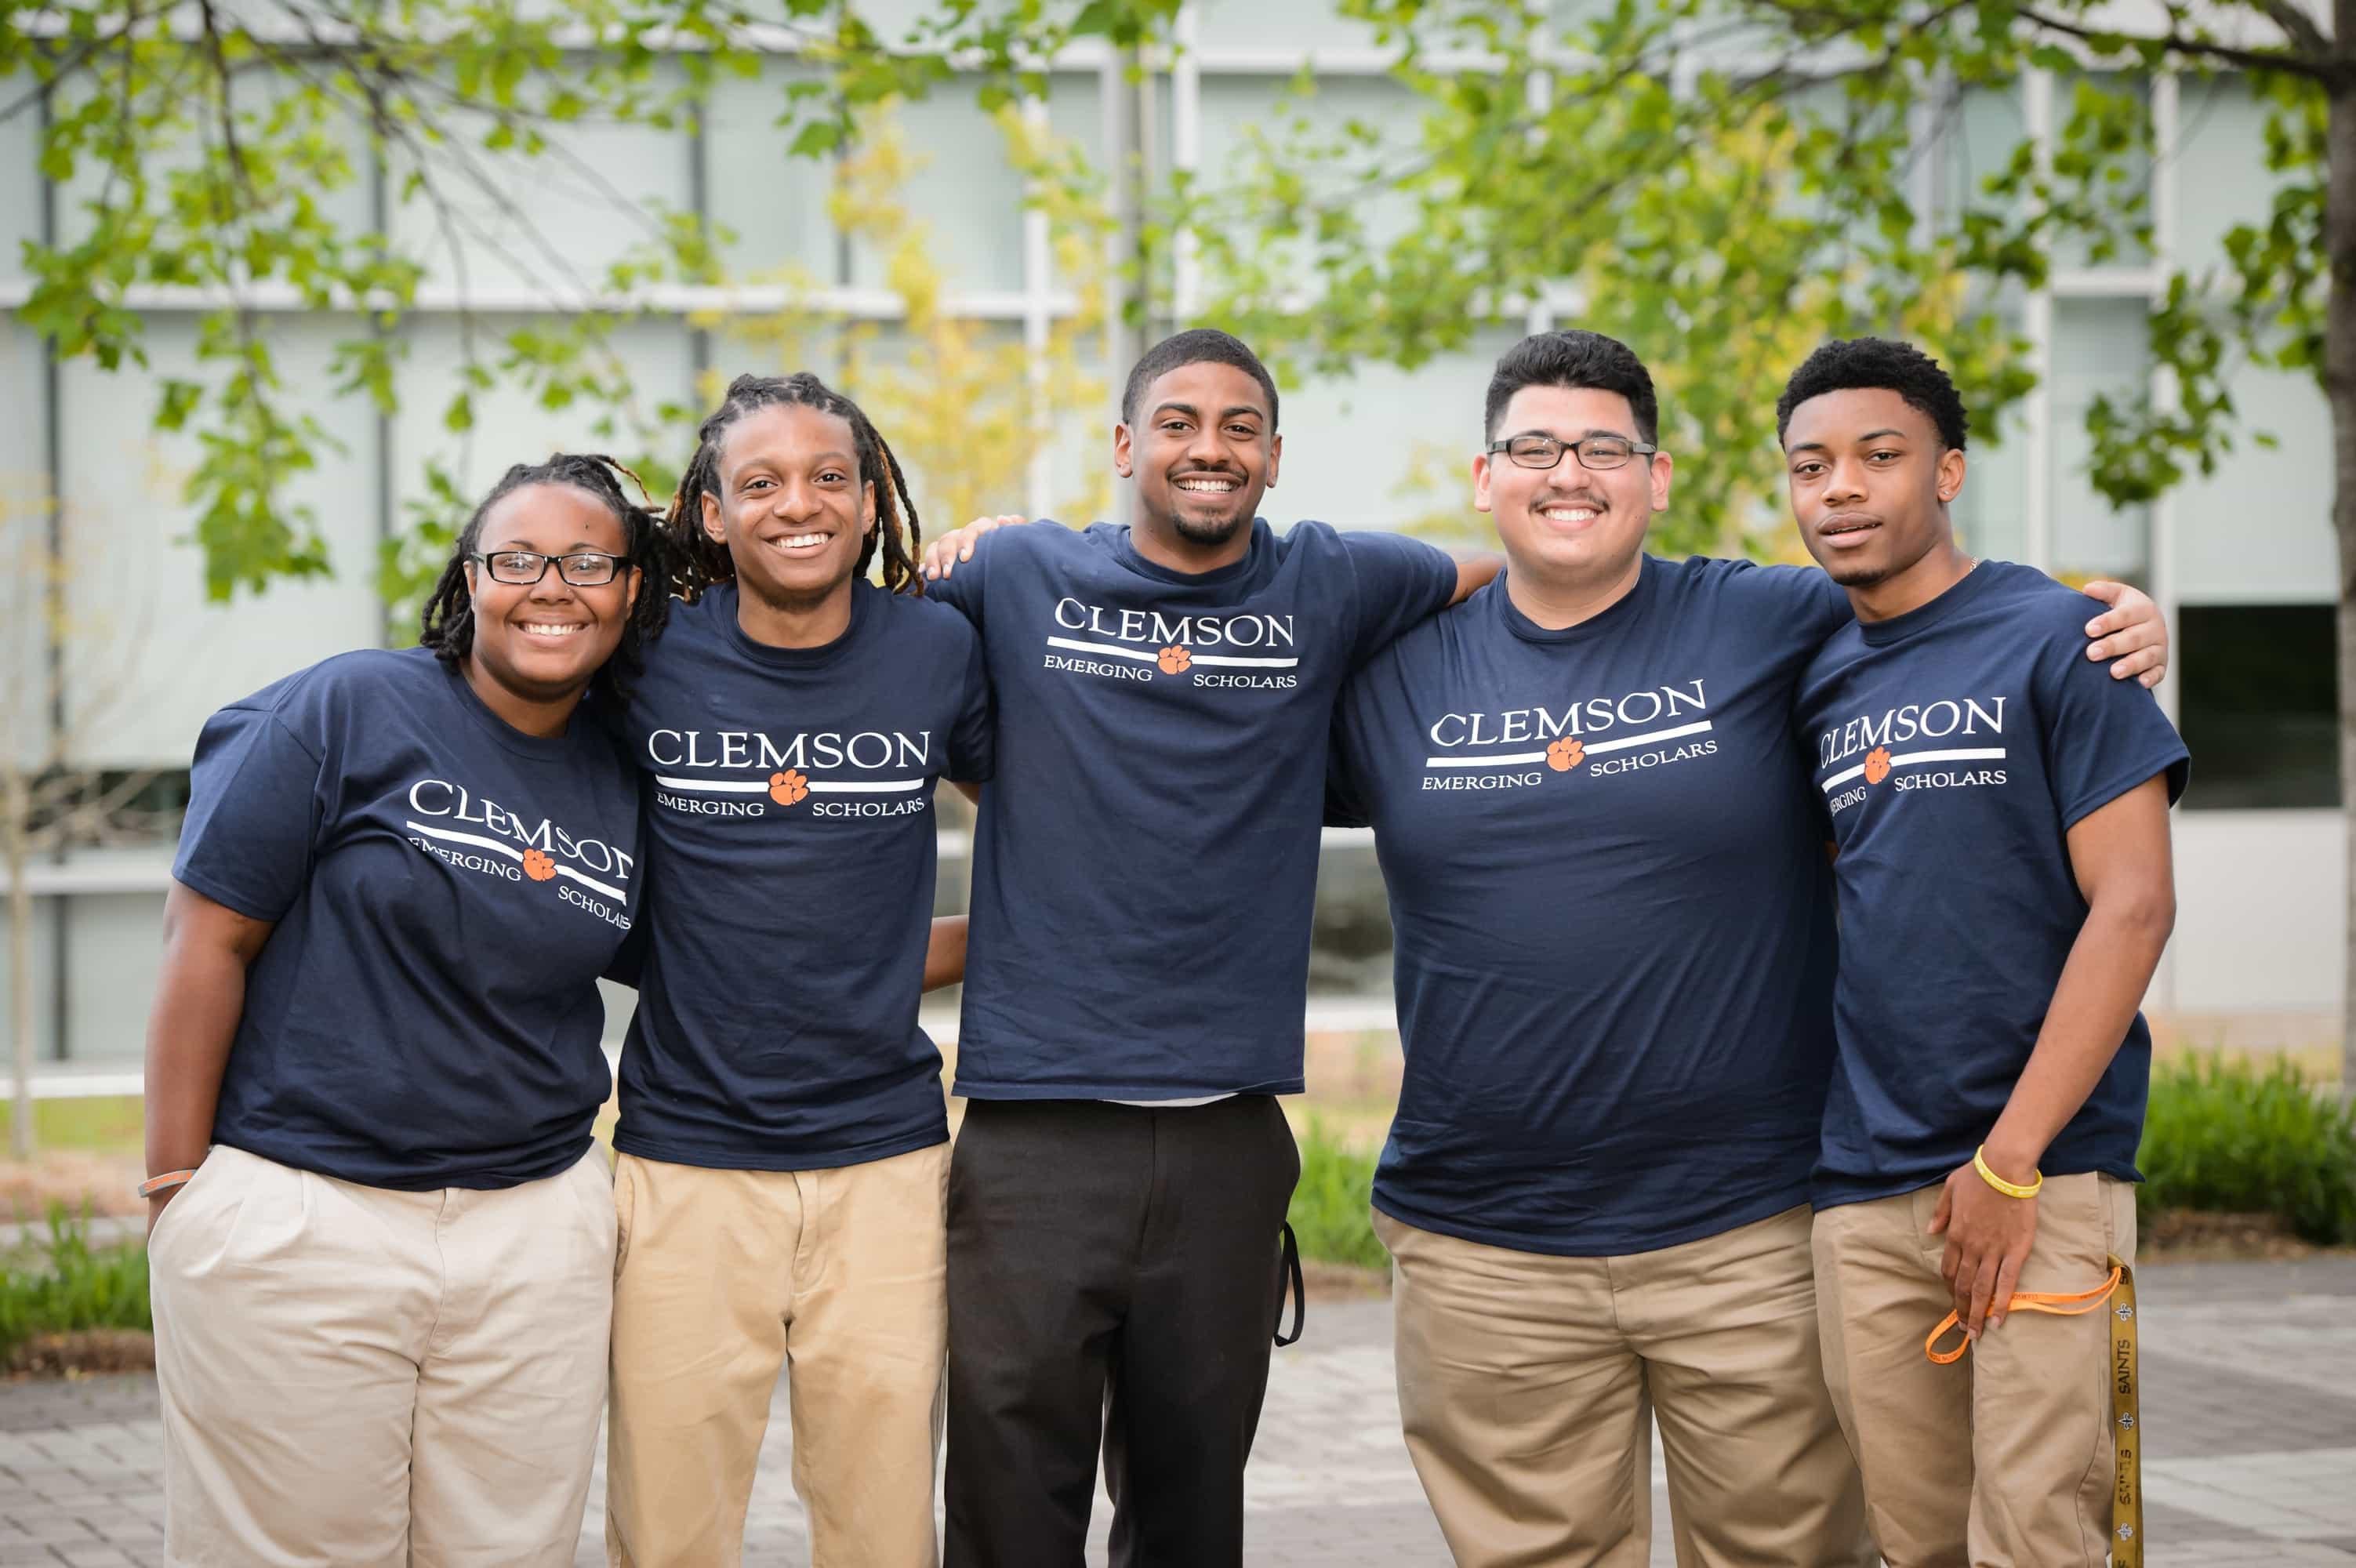 Clemson university students